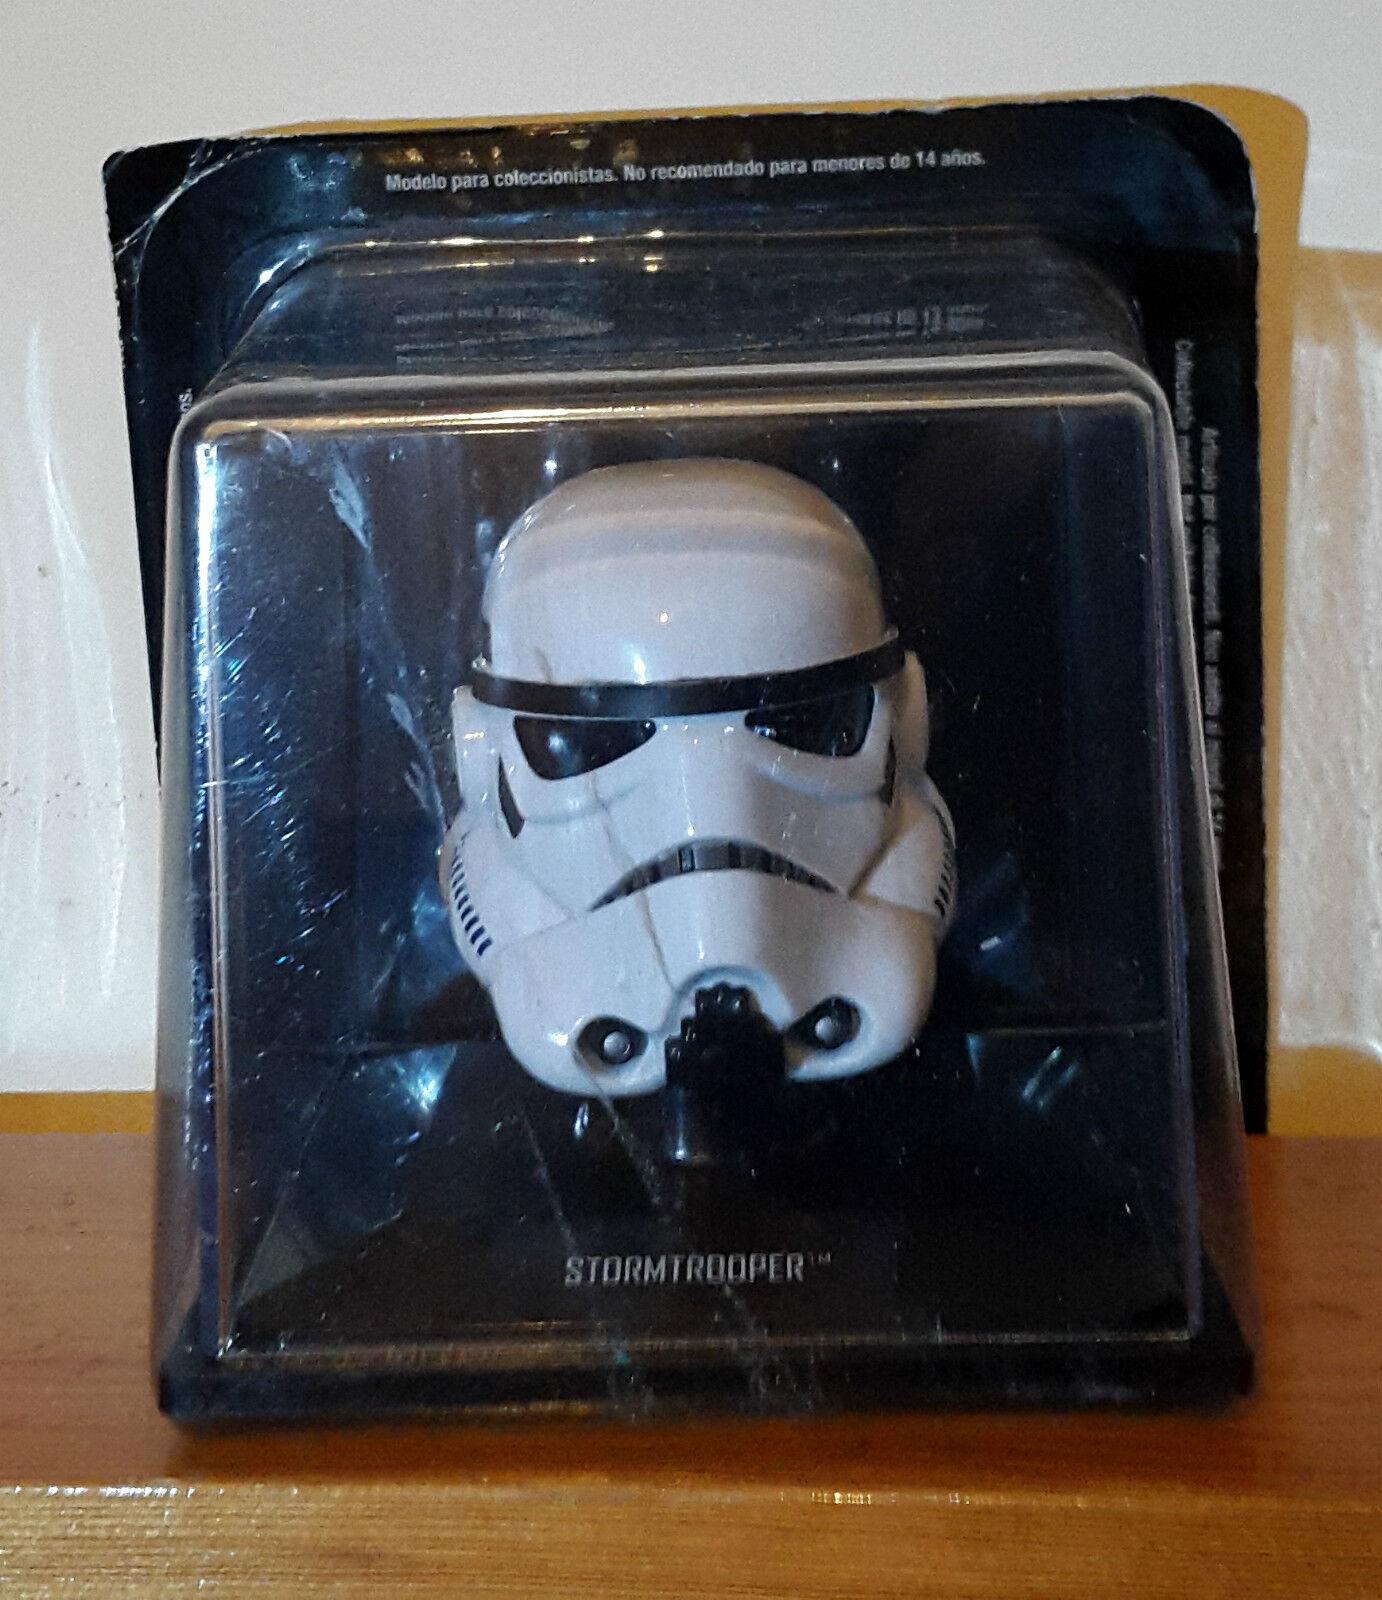 Star wars helmet collection